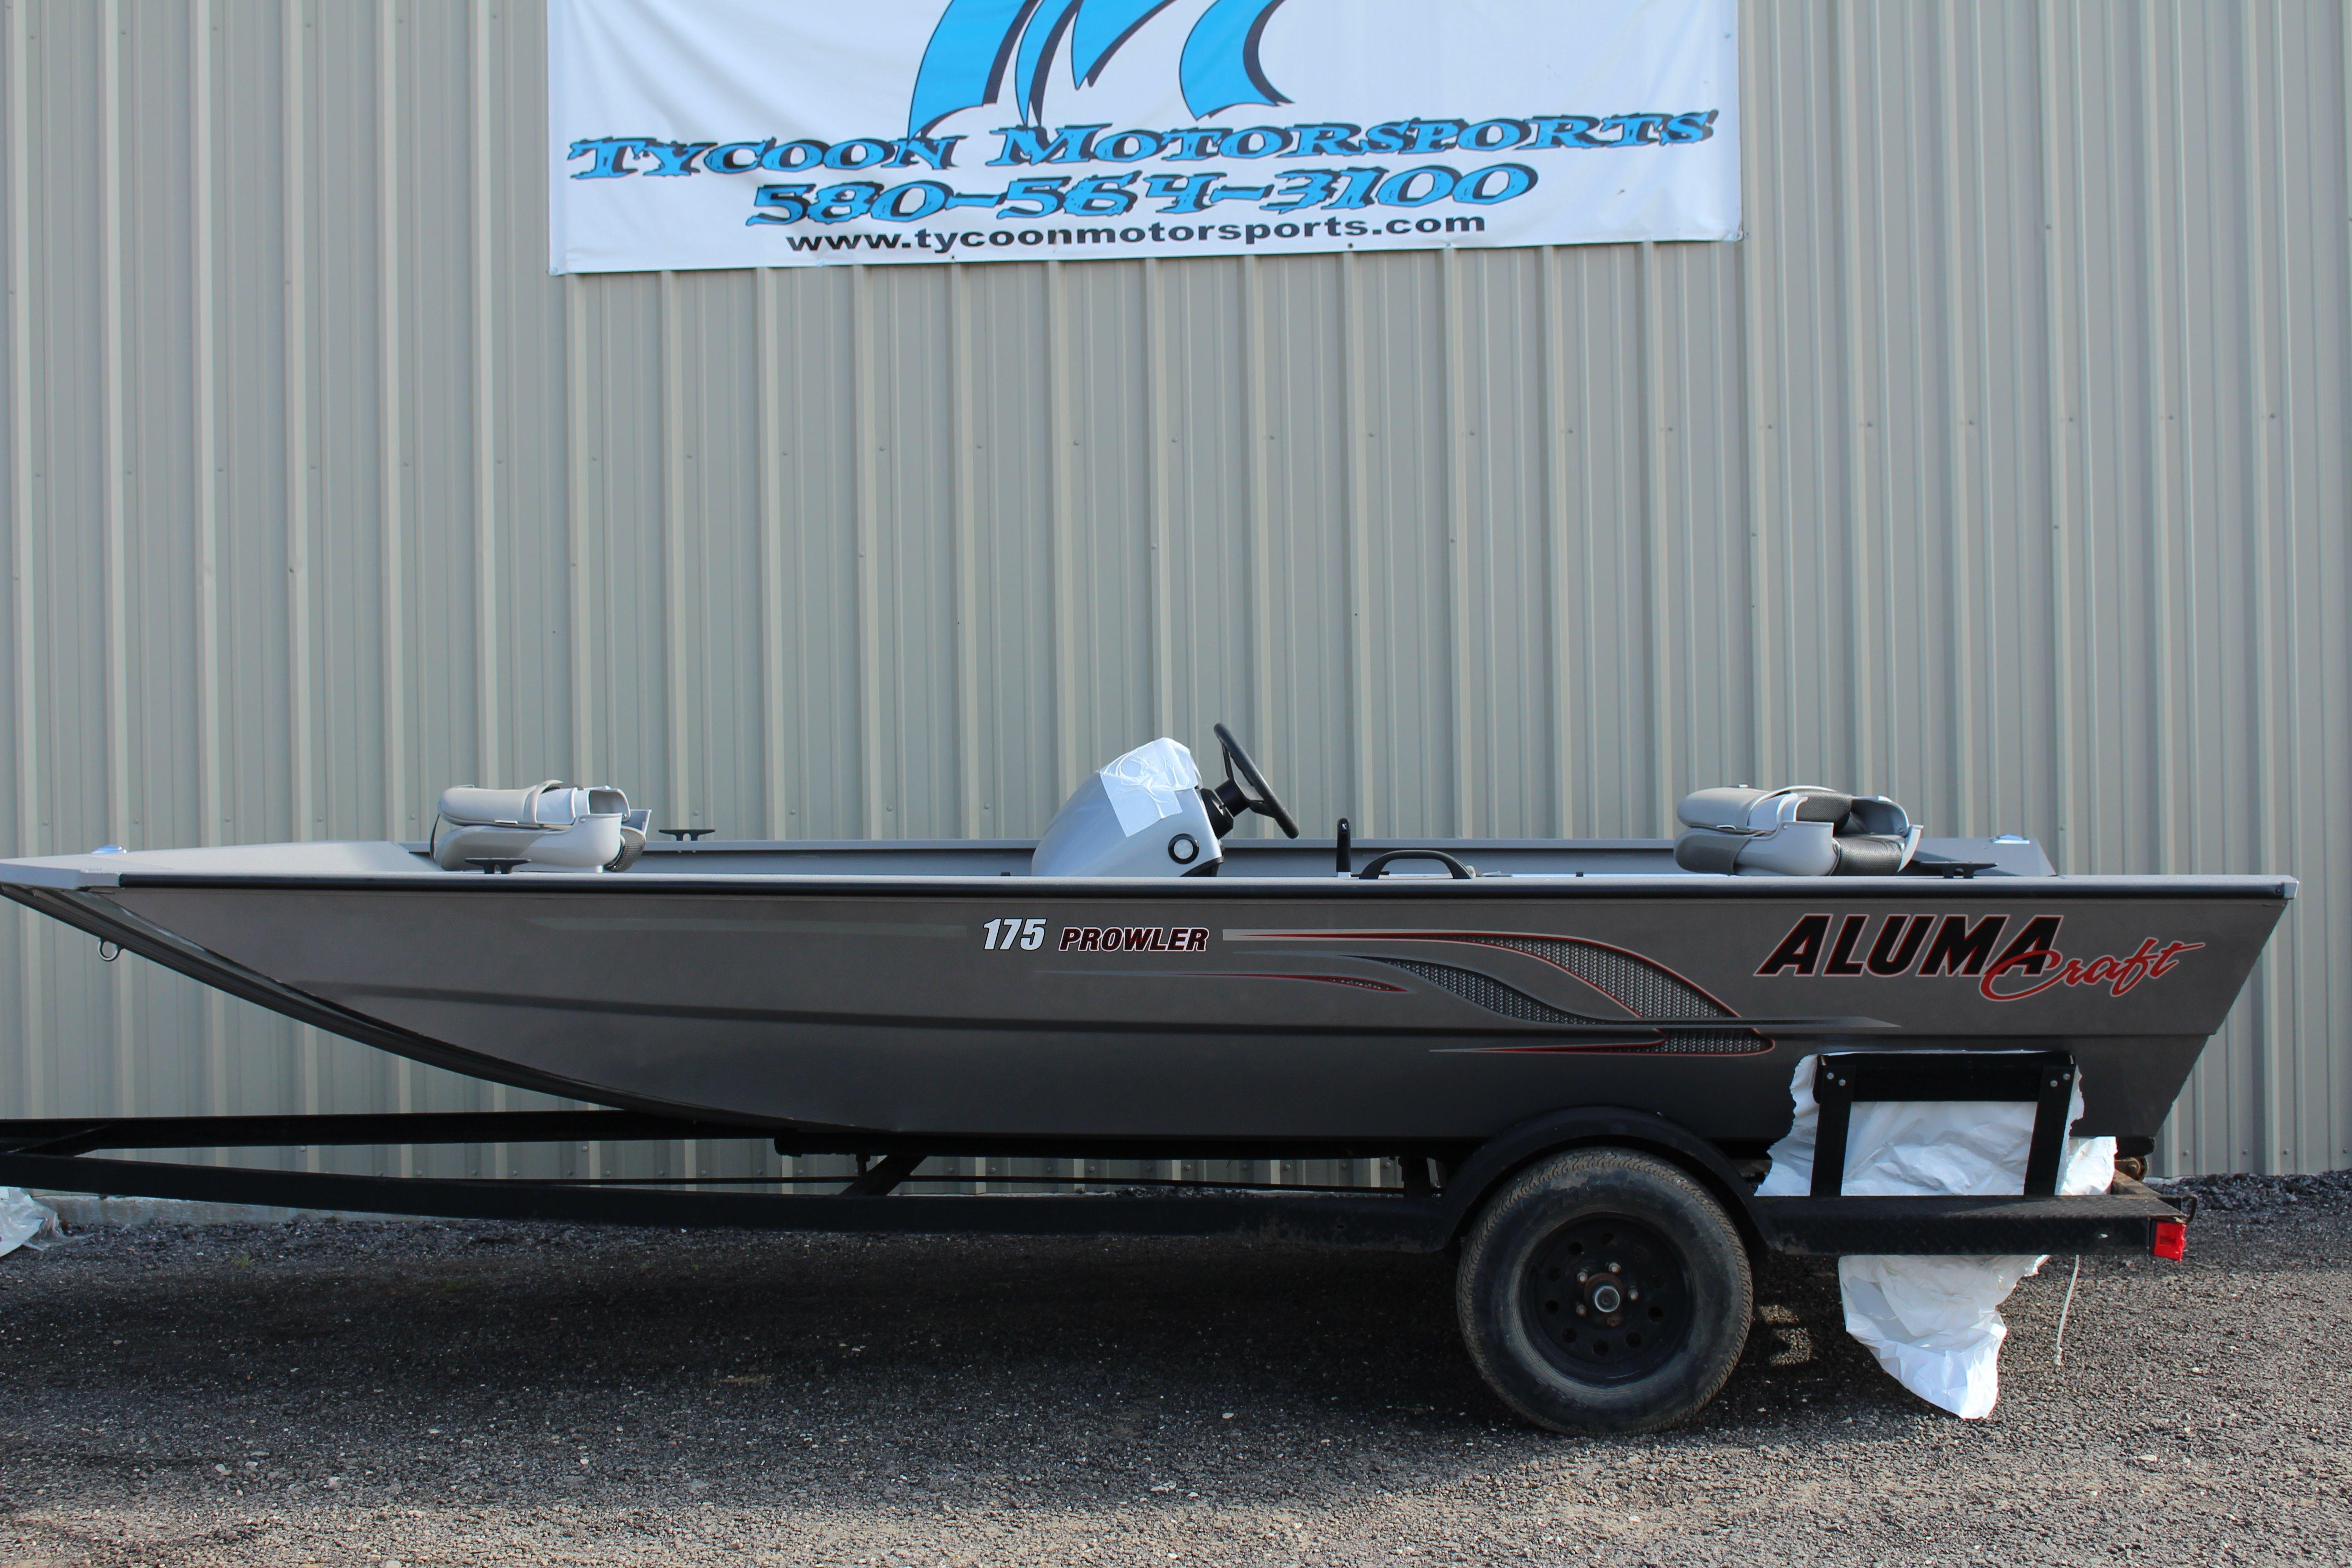 2015 Alumacraft Prowler 175